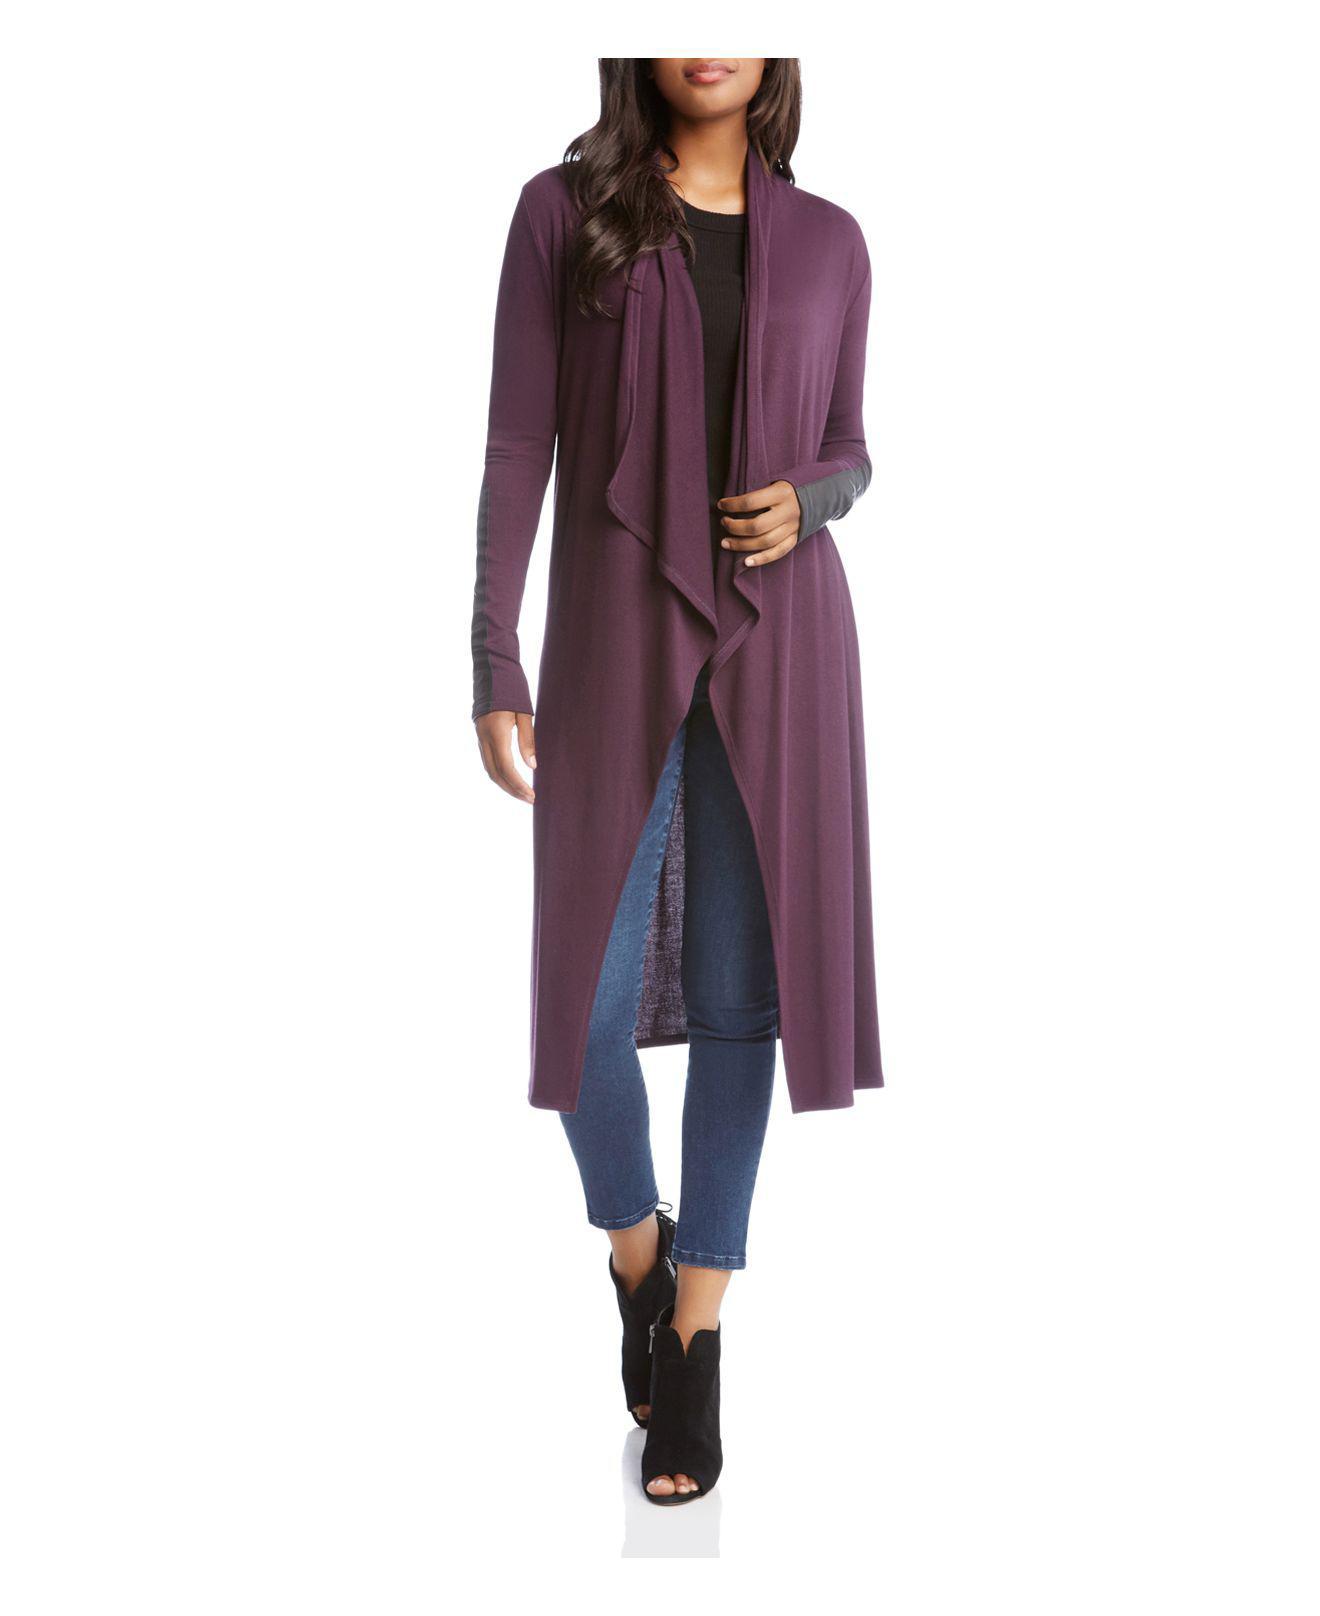 Karen kane Faux Leather Trimmed Duster Cardigan in Purple | Lyst